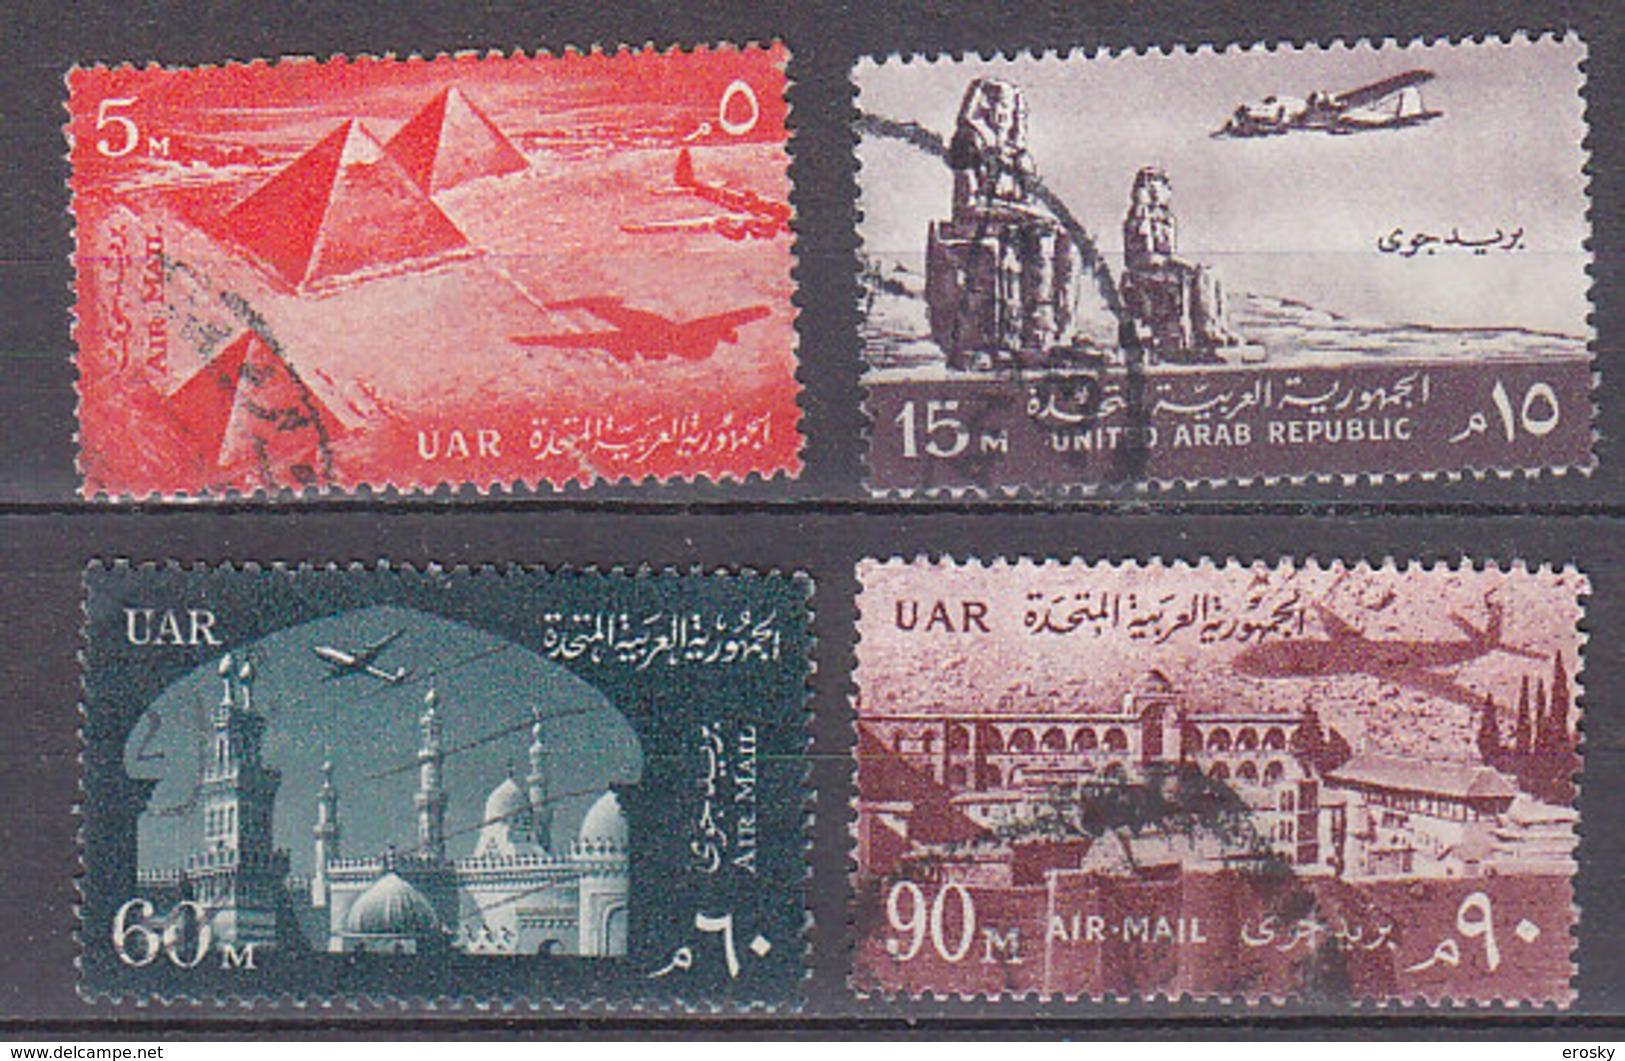 A0783 - EGYPTE EGYPT AERIENNE Yv N°81/84 - Poste Aérienne